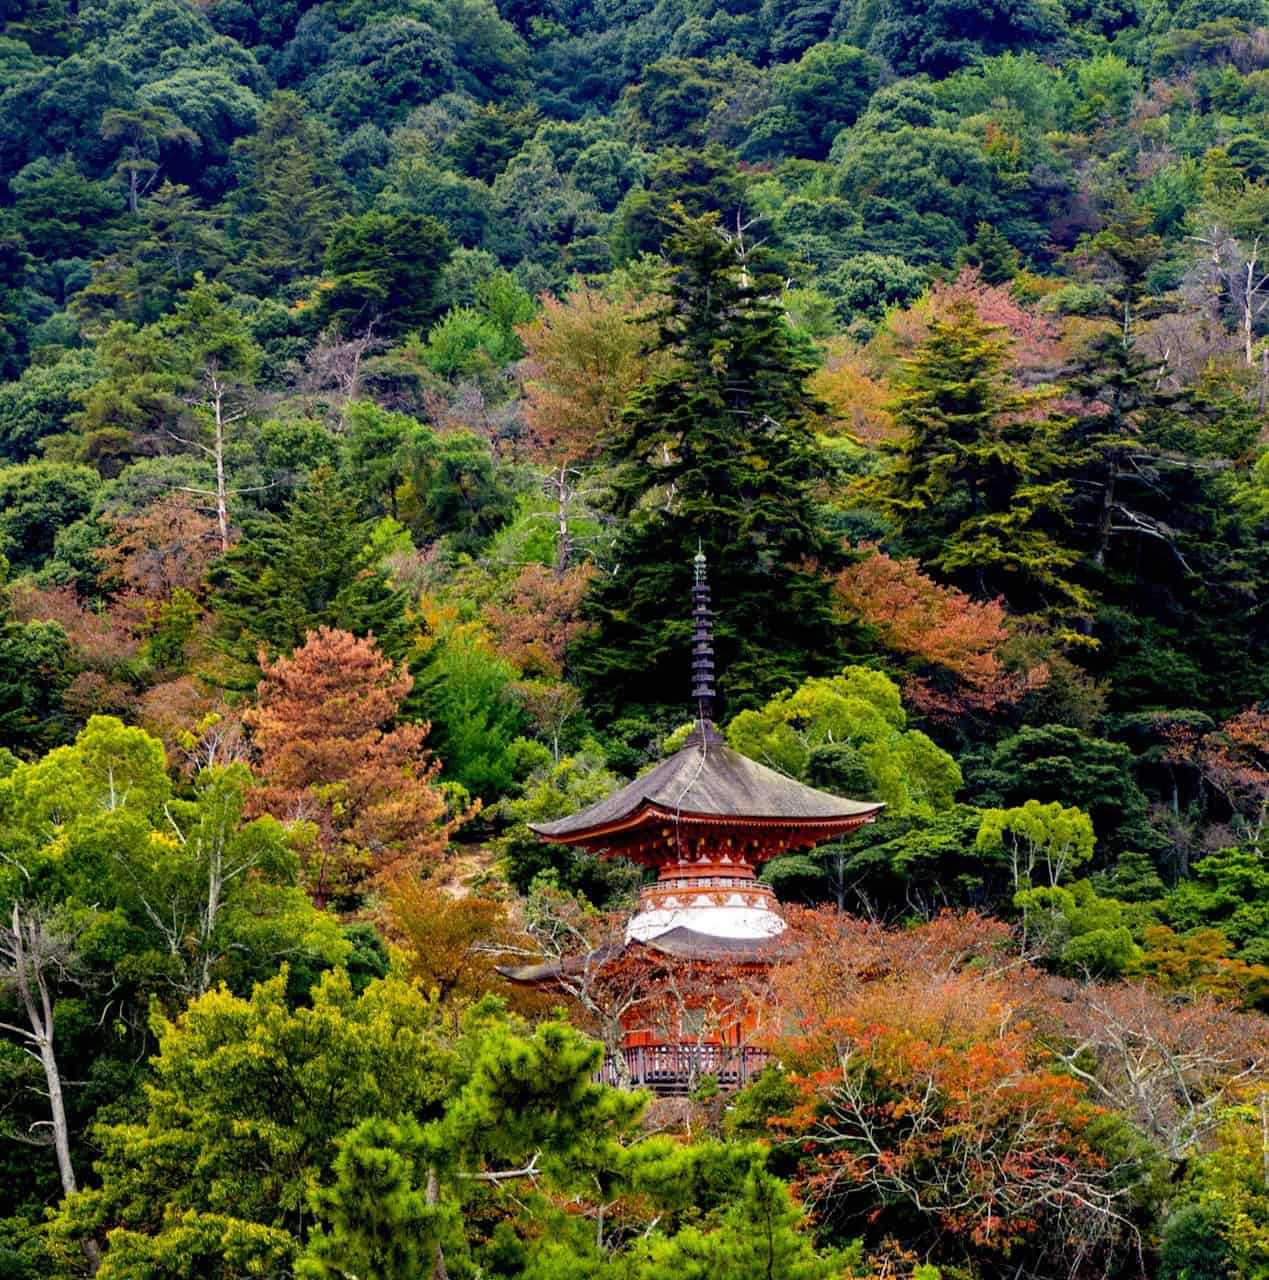 L'île de Miyajima en automne, la saison du koyo